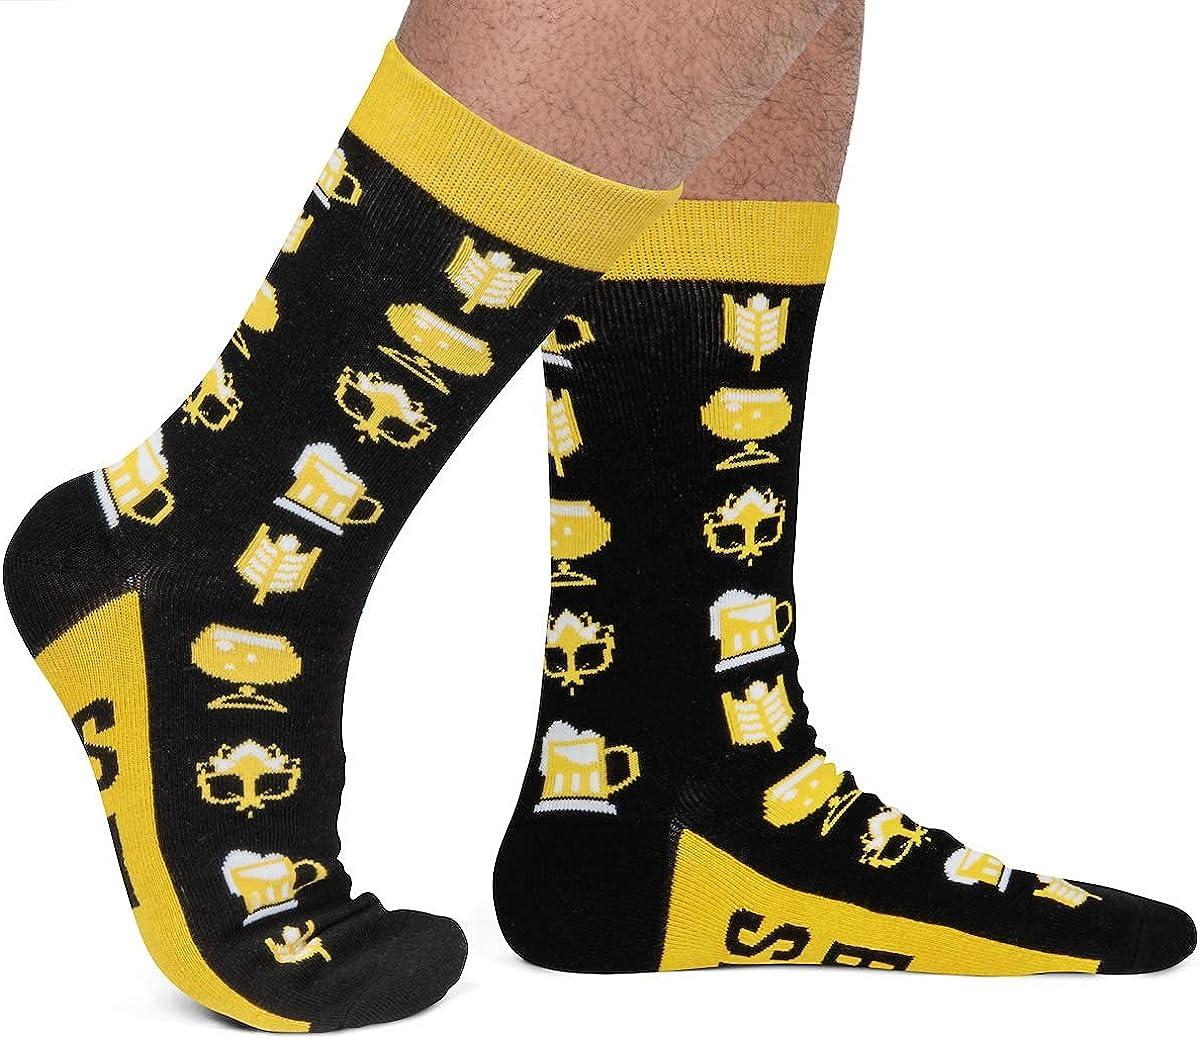 Tobar Novelty Funny Cotton Socks Perfect Gift Idea Shoes /& Halloween Gag Designs